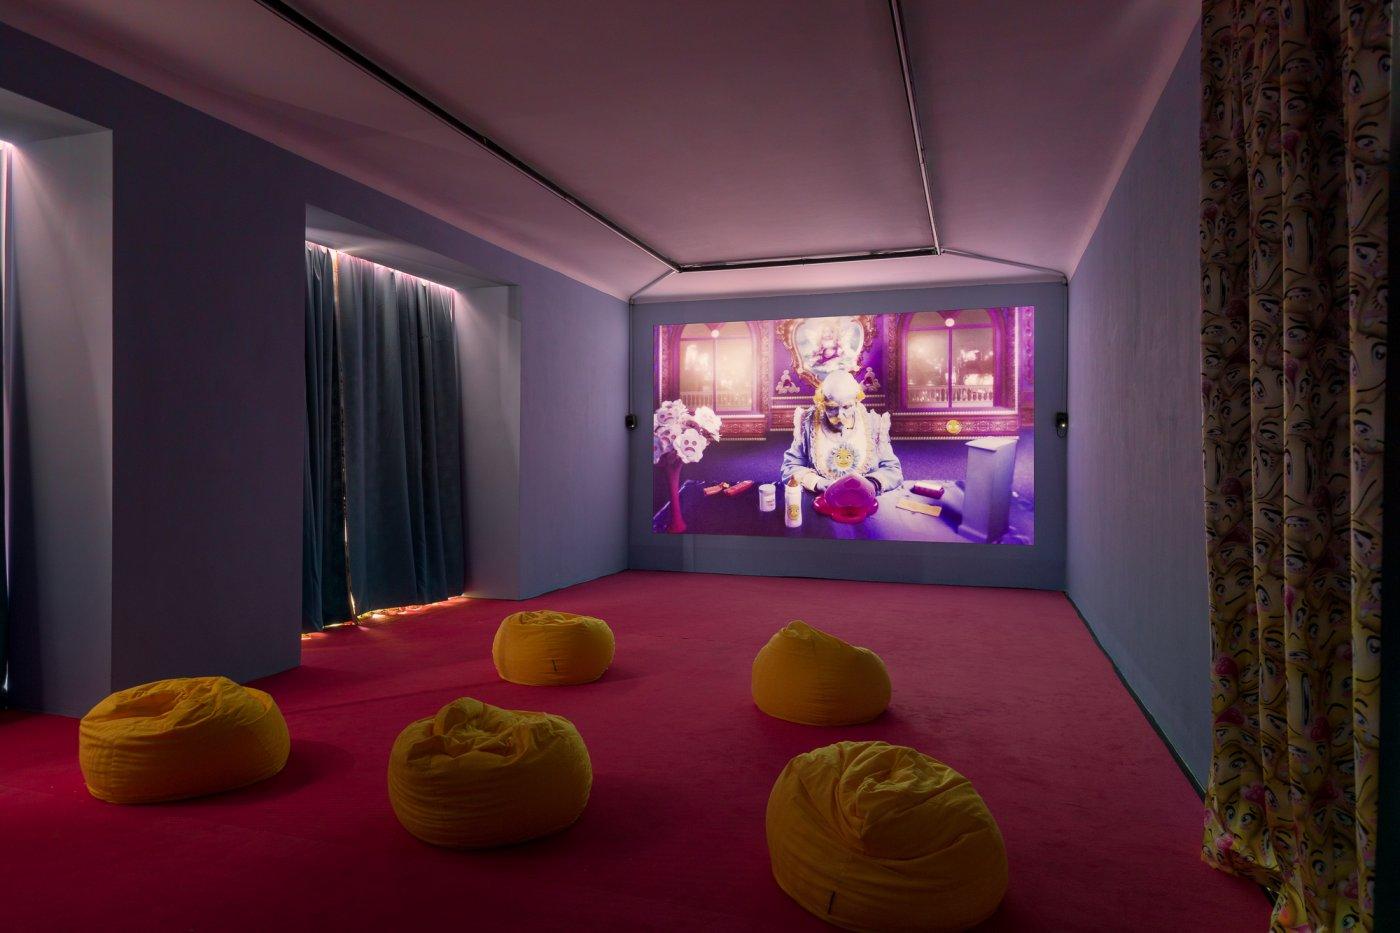 Galerie Kandlhofer Rachel Maclean new 7